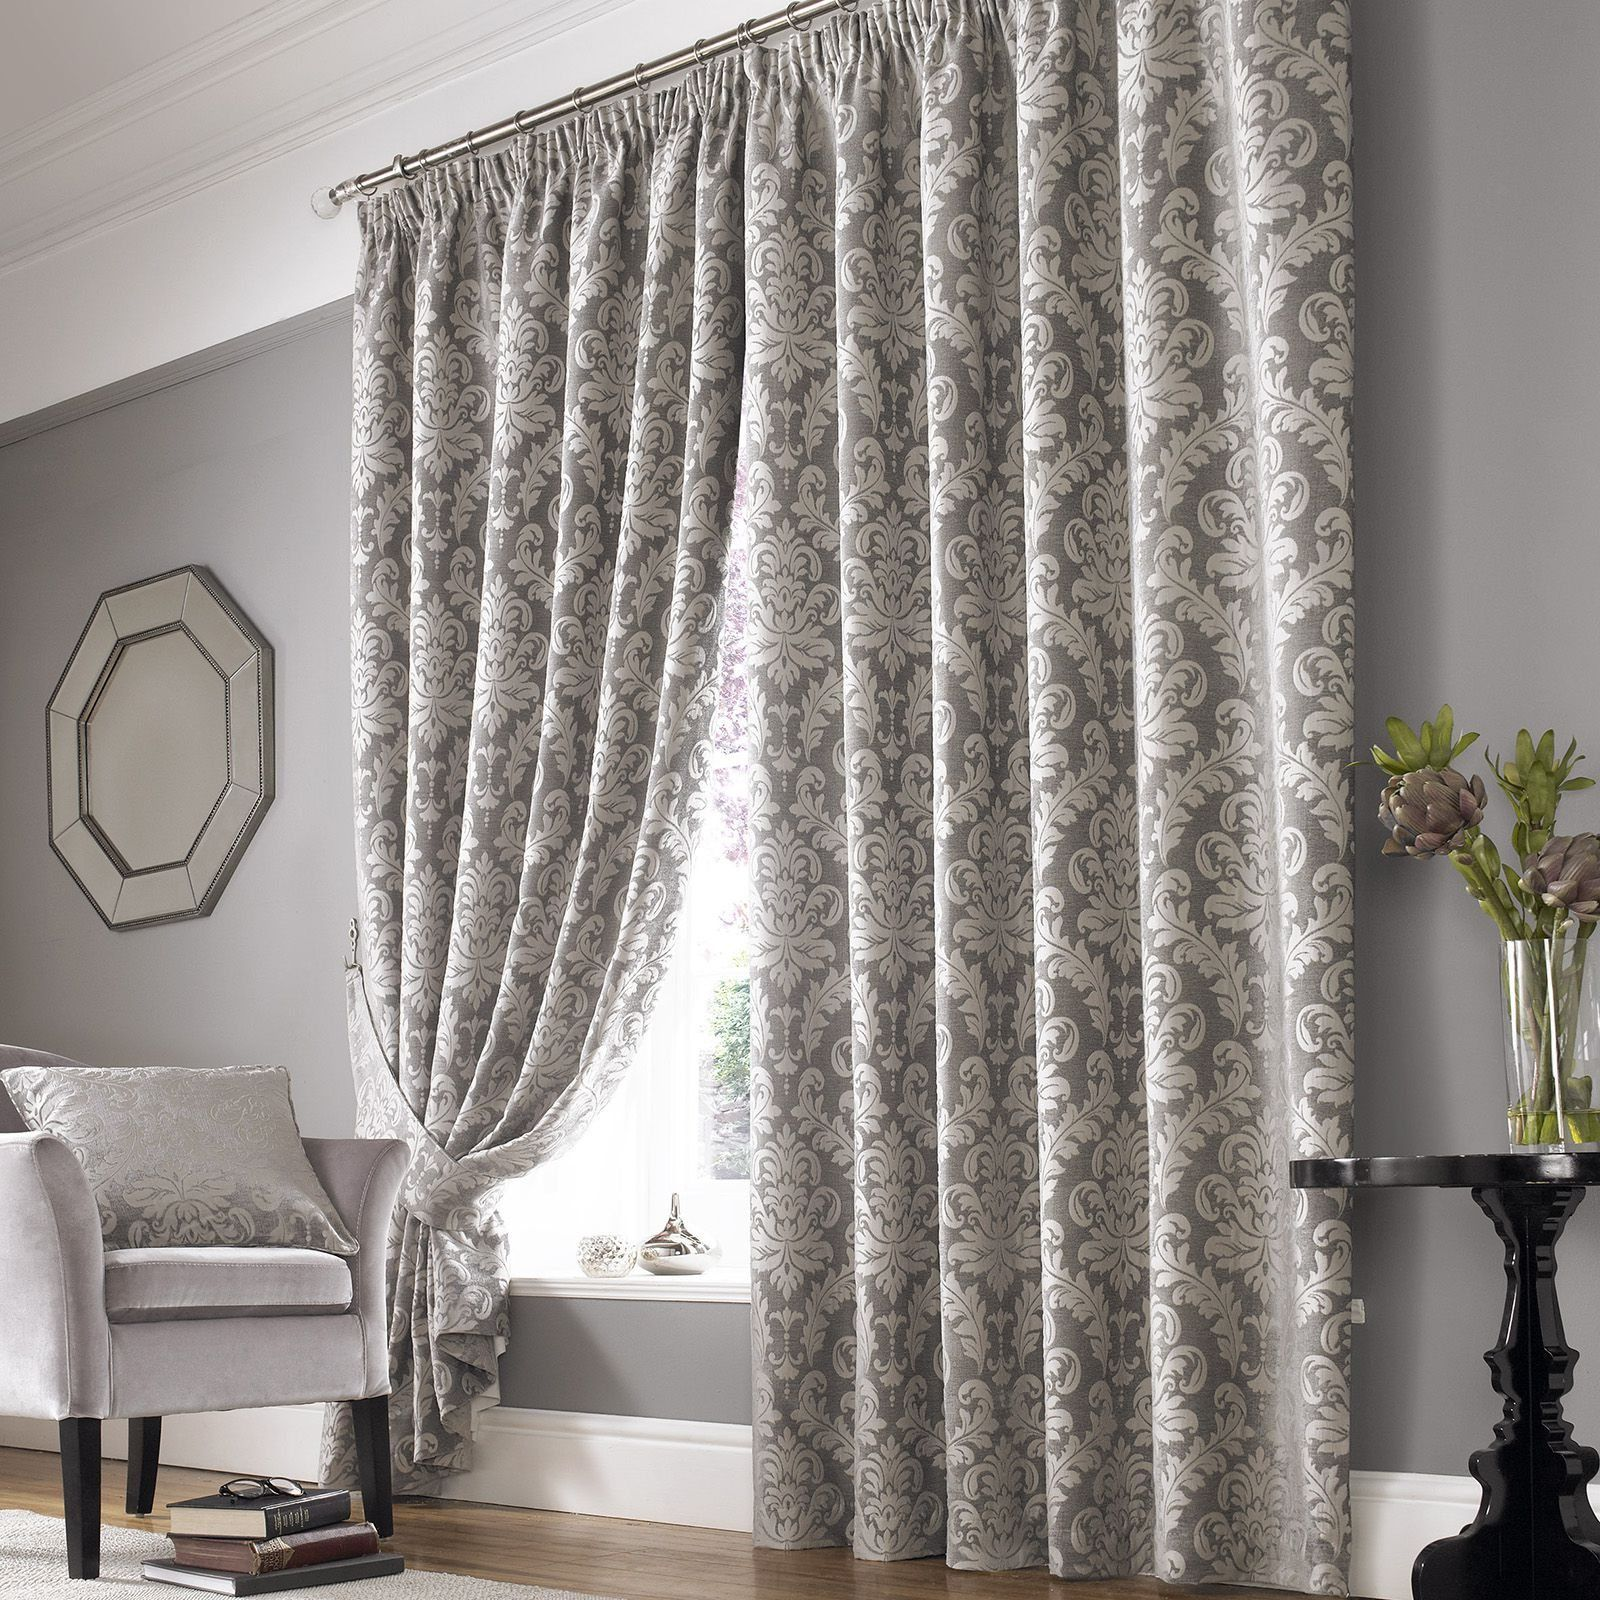 Stunning And Elegant Damask Curtains Damask Curtains Curtains For Grey Walls Dining Room Curtains